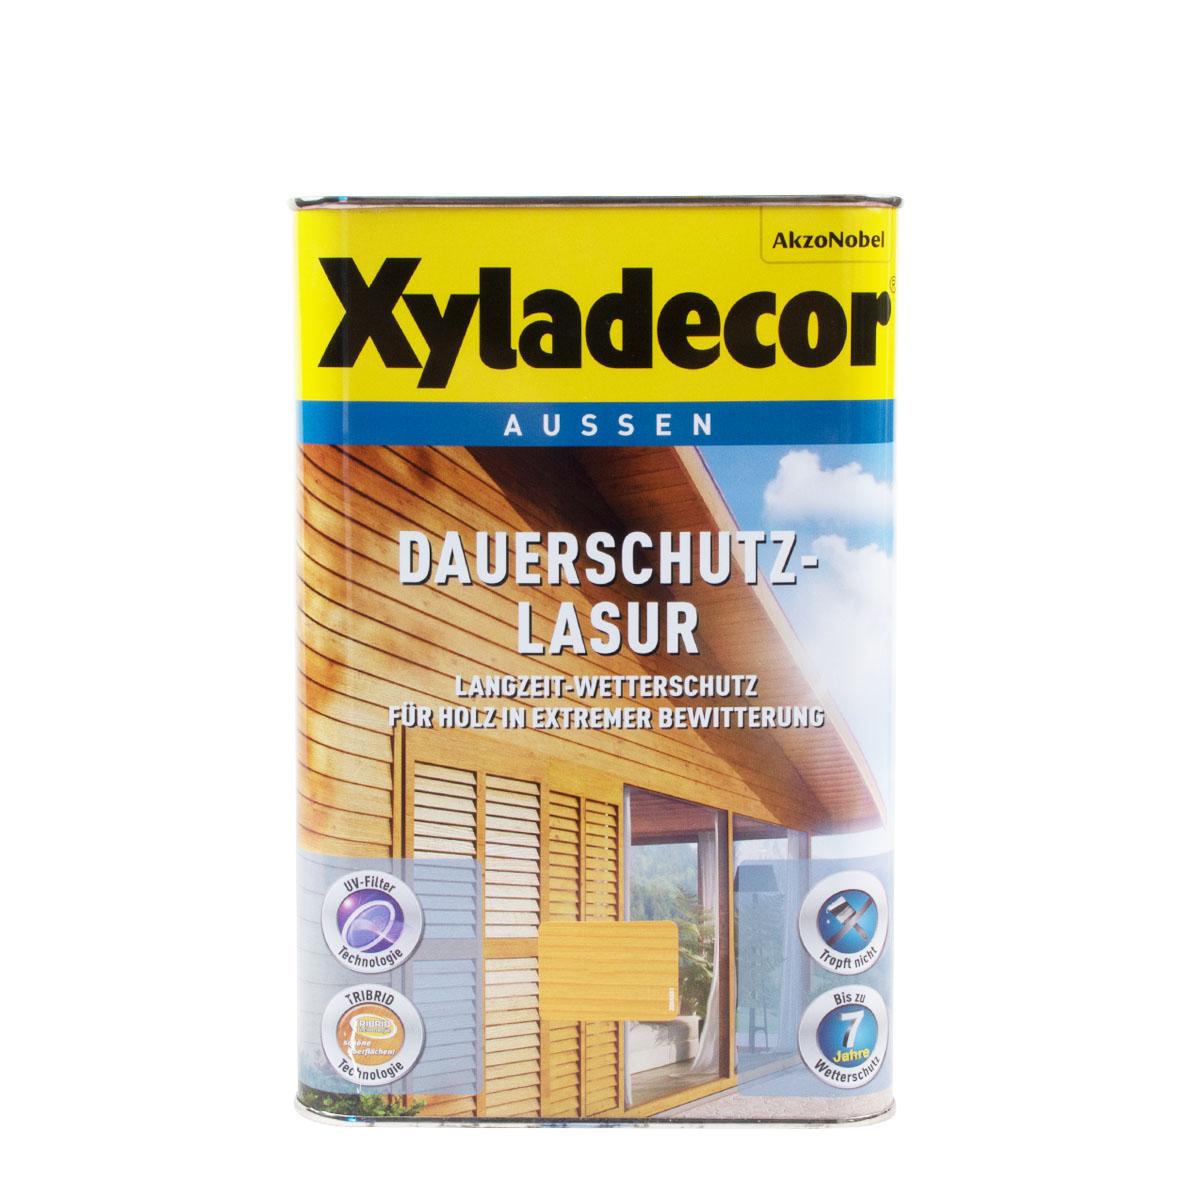 Xyladecor Dauerschutz-Lasur 4L versch. Farbtöne, Holzschutzlasur